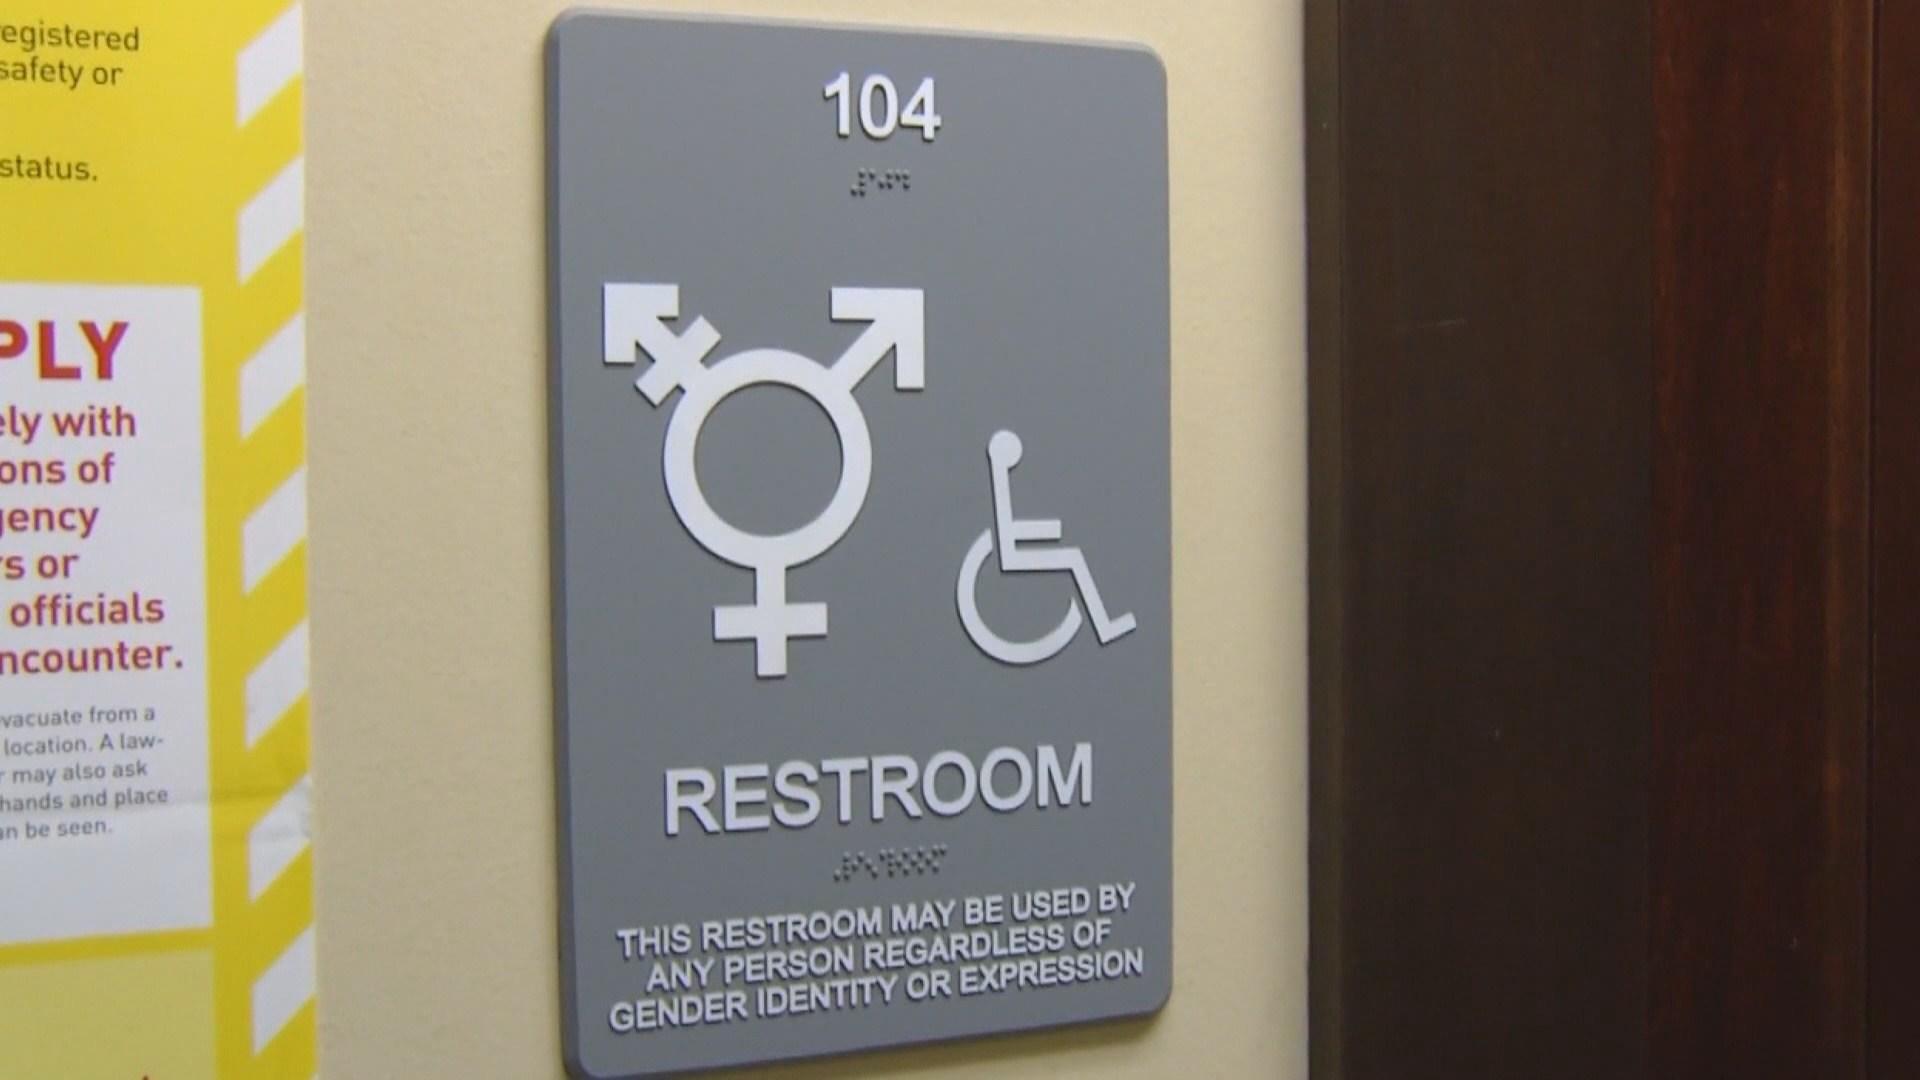 Target Transgender Bathroom Policy Issues Wowk 13